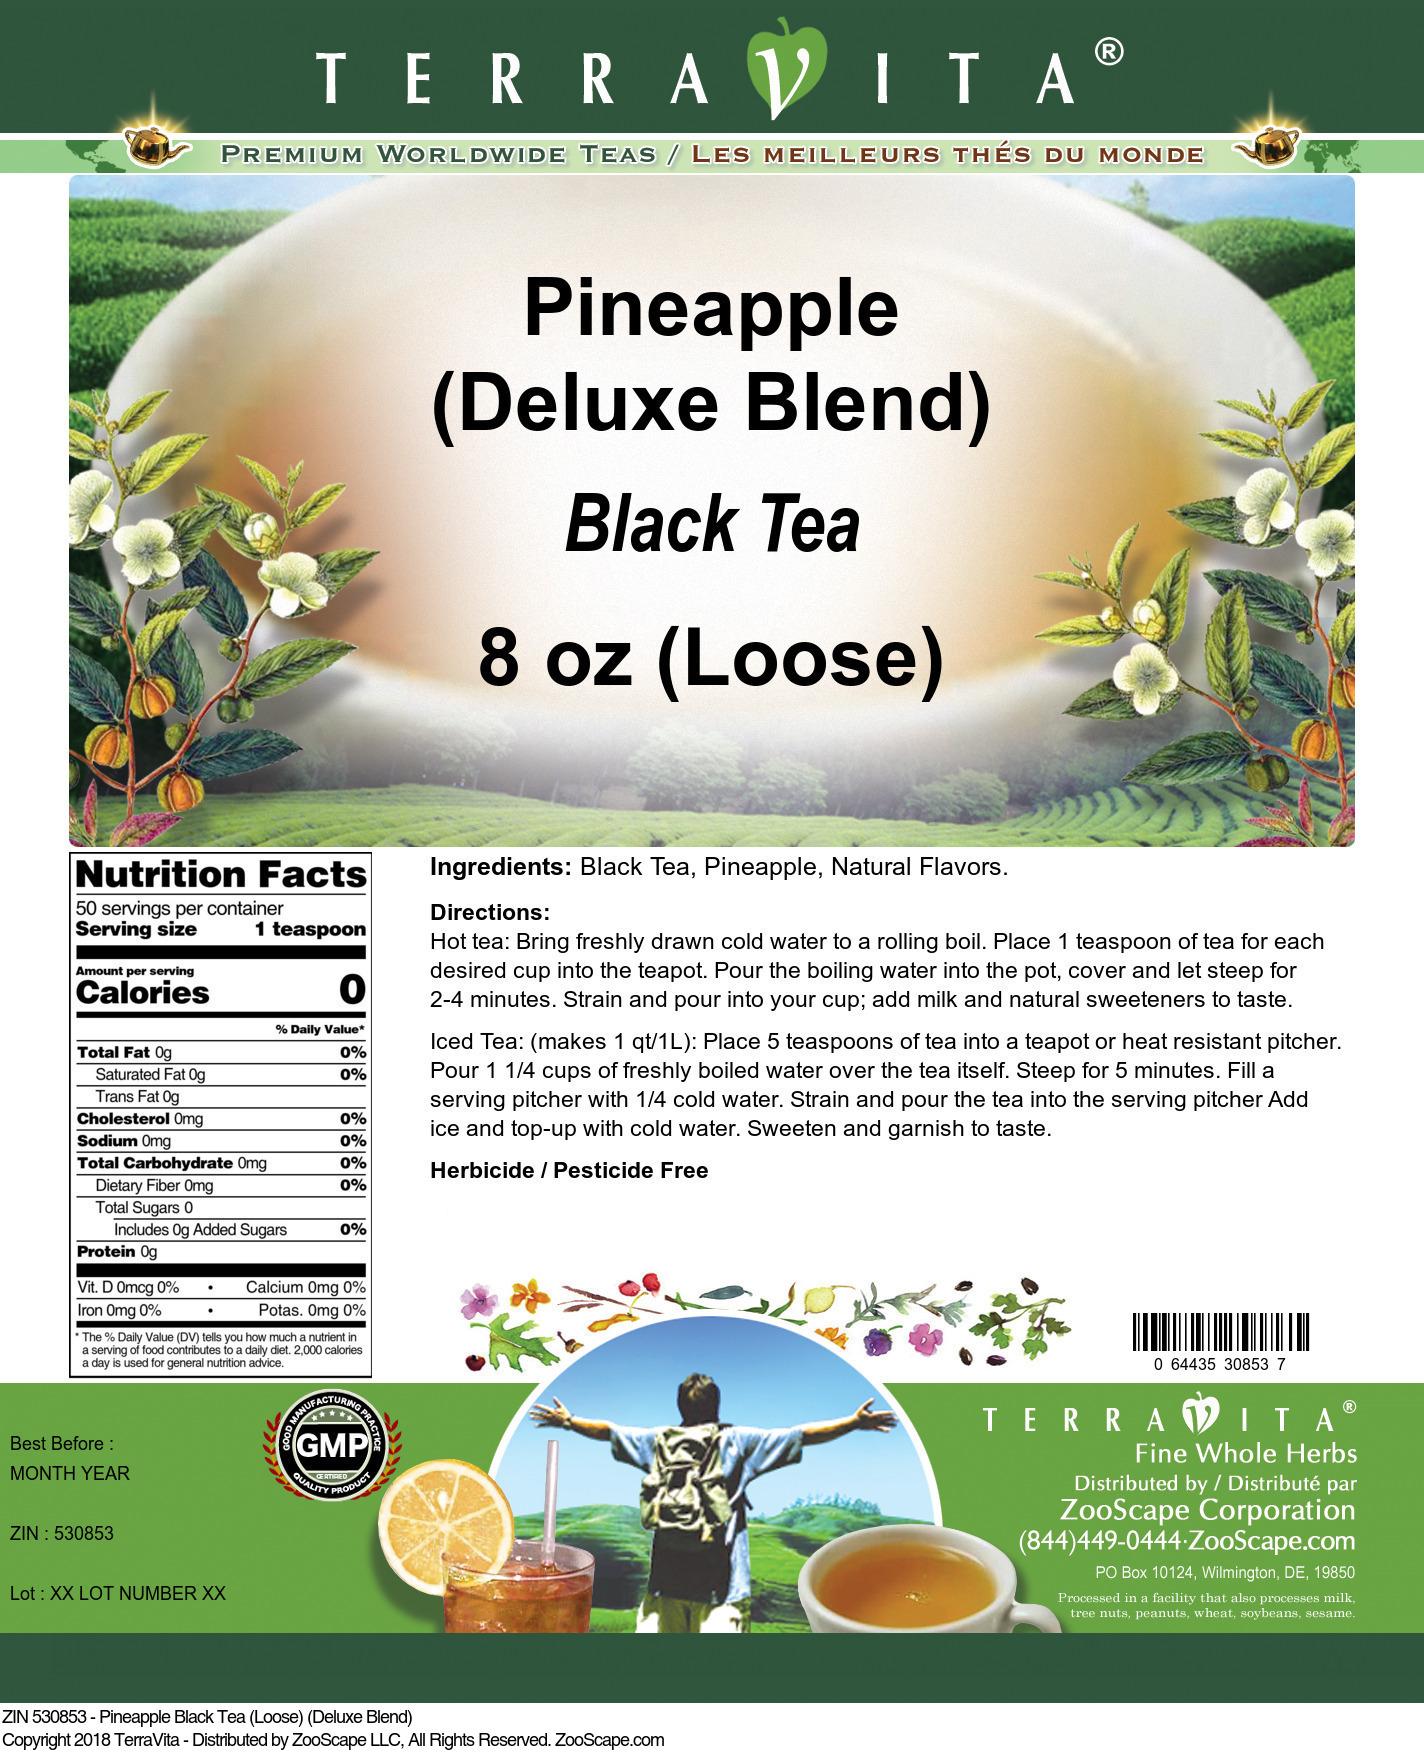 Pineapple Black Tea (Loose) (Deluxe Blend)